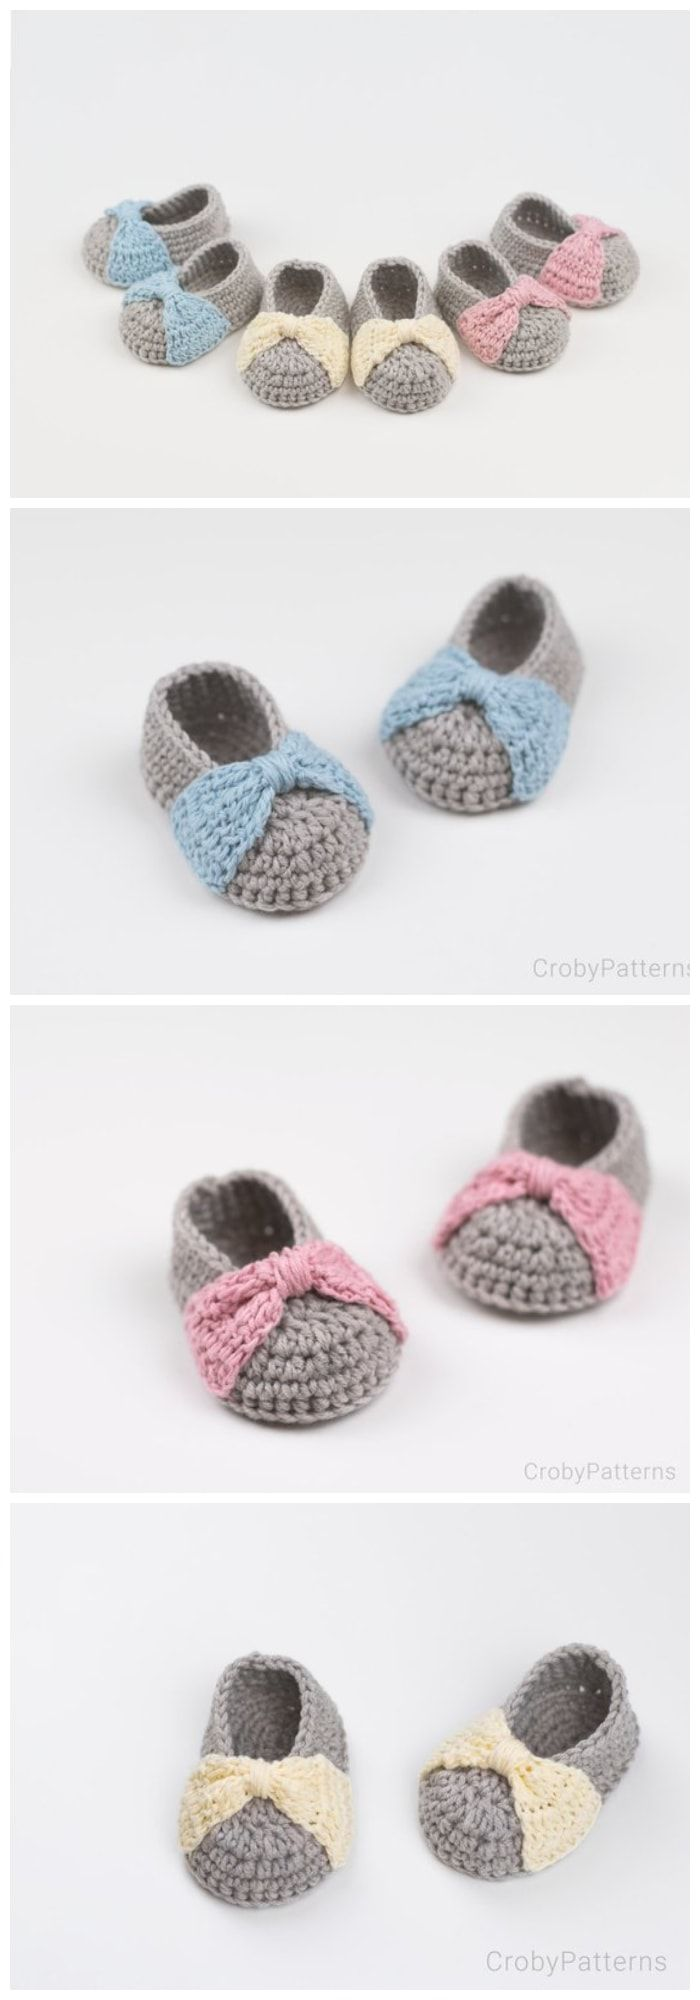 16 Free Crochet Baby Booties #crochetbabyshoes